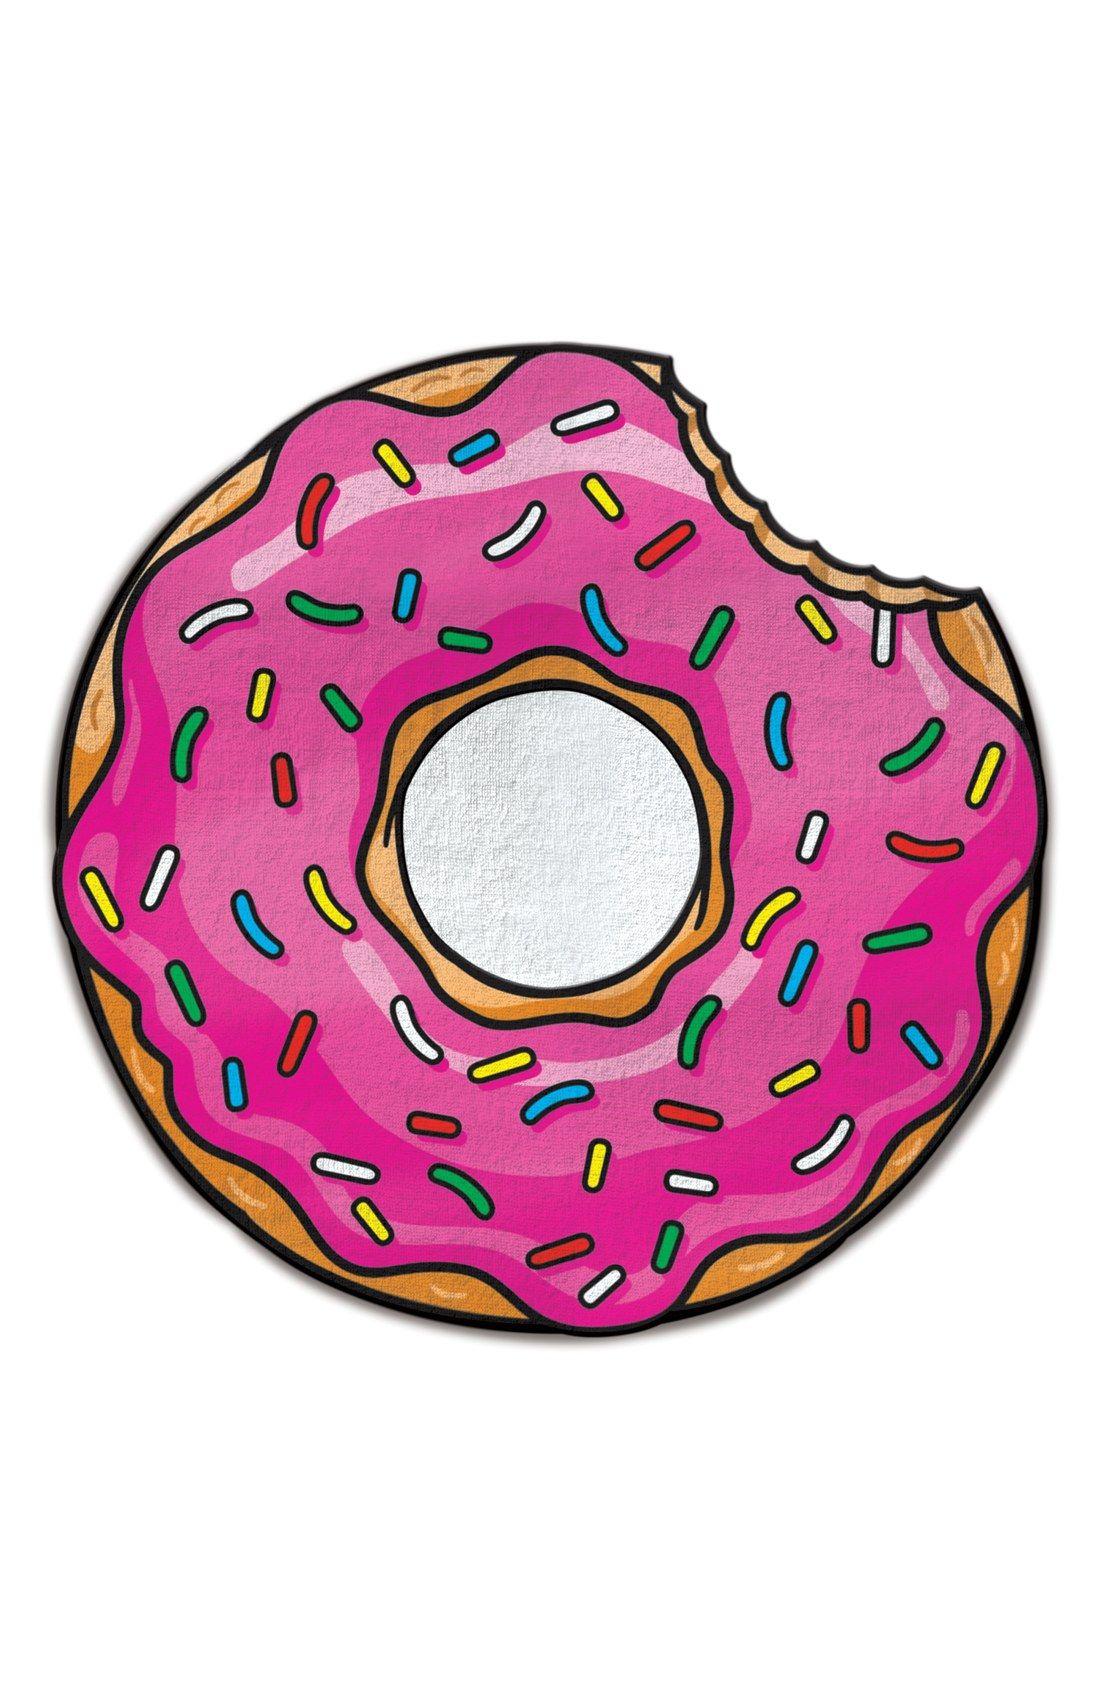 A Super Cute Donut Beach Towel Yes Please Well Take